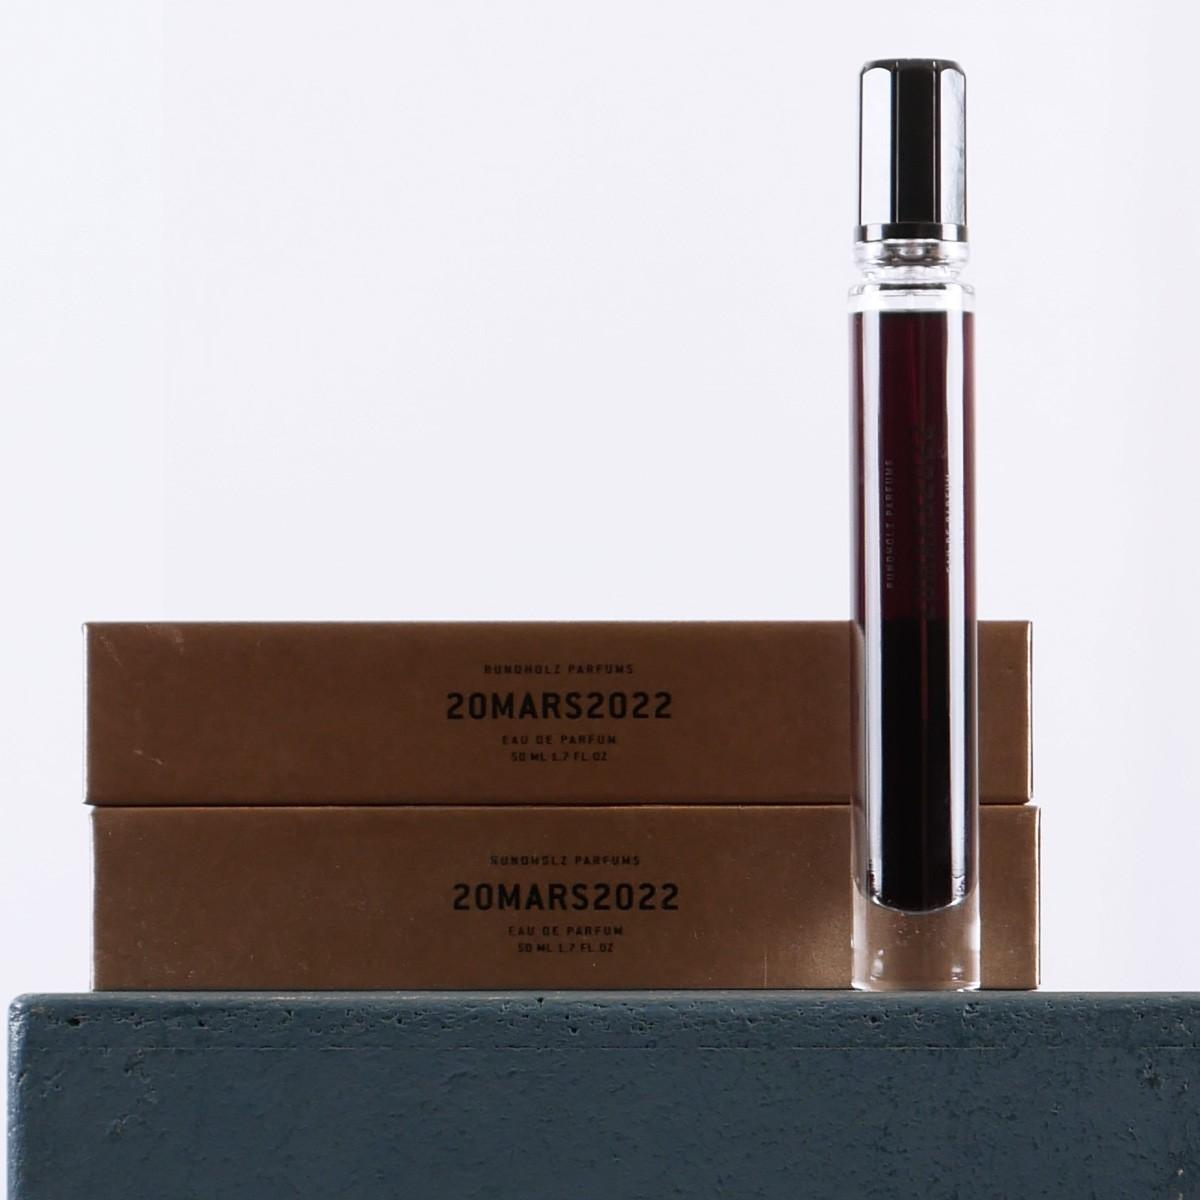 parfüm rundholz